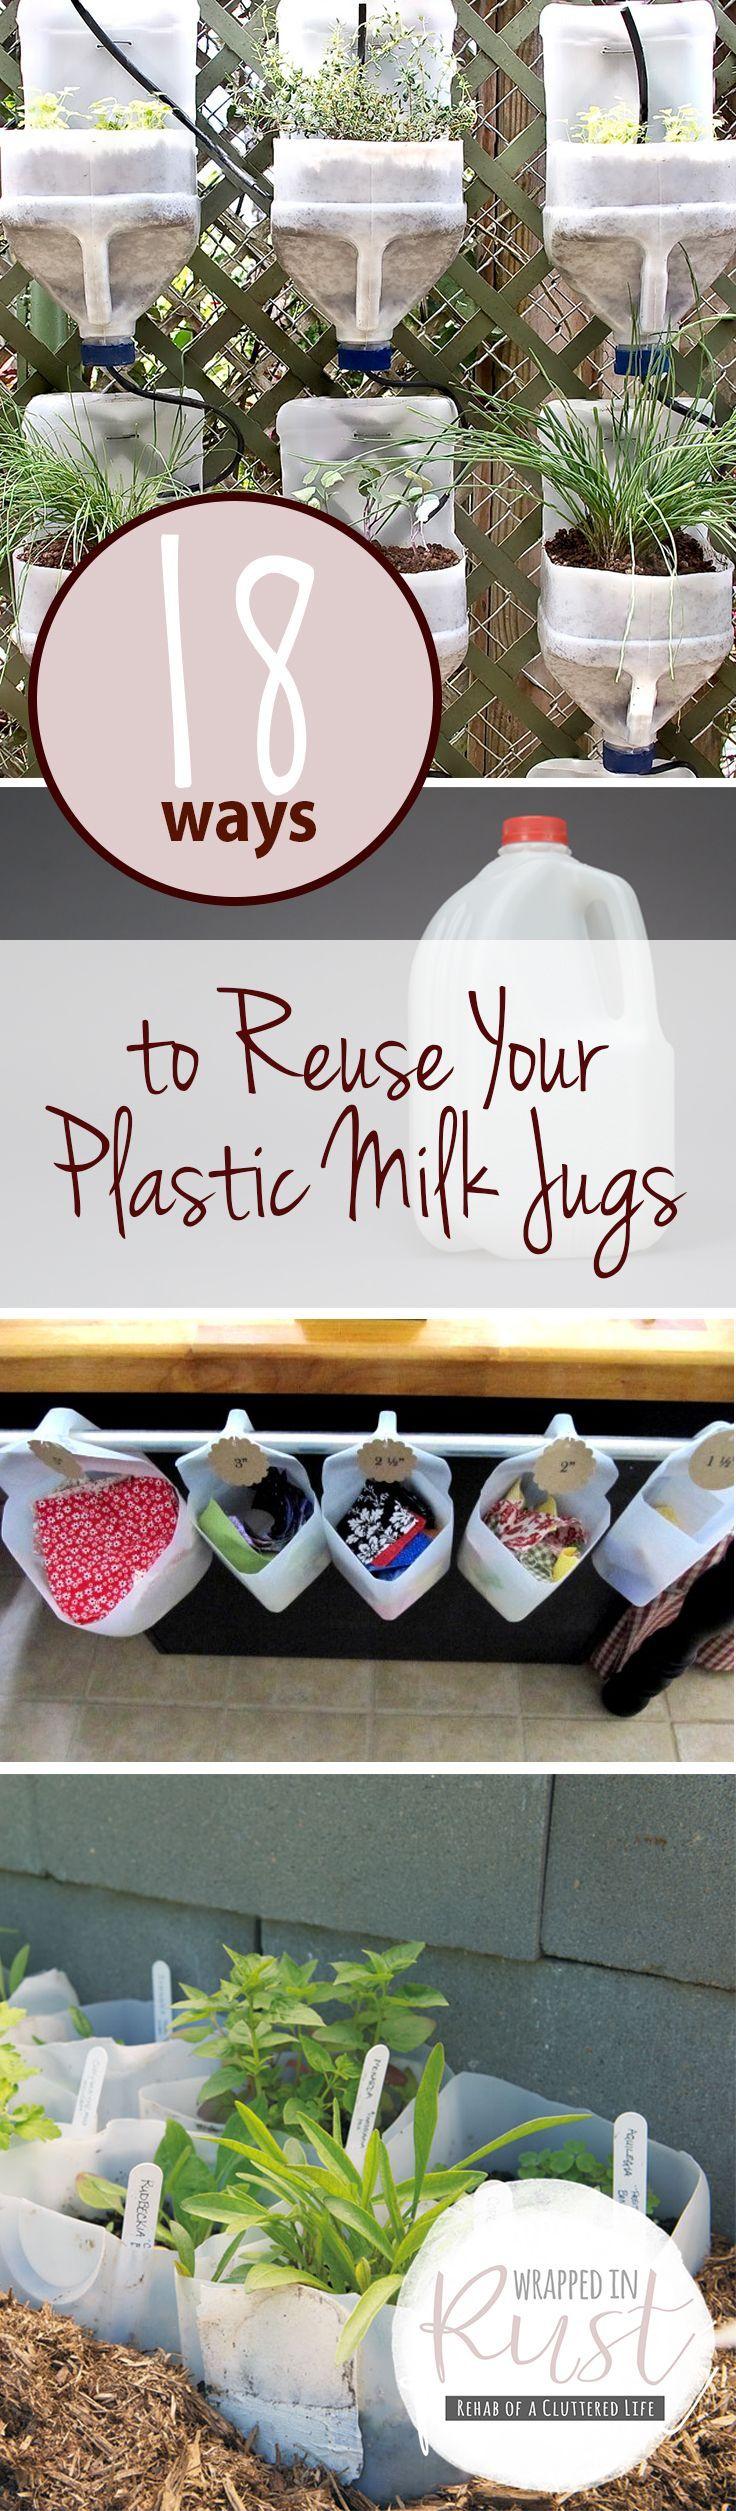 How to Reuse Plastic Milk Jugs, Plastic Milk Jugs, Things to Do With Plastic Milk Jugs, Repurposing Milk Jugs, Things to Do With Milk Jugs, Popular Pin, How to Repurpose Plastic Jugs.